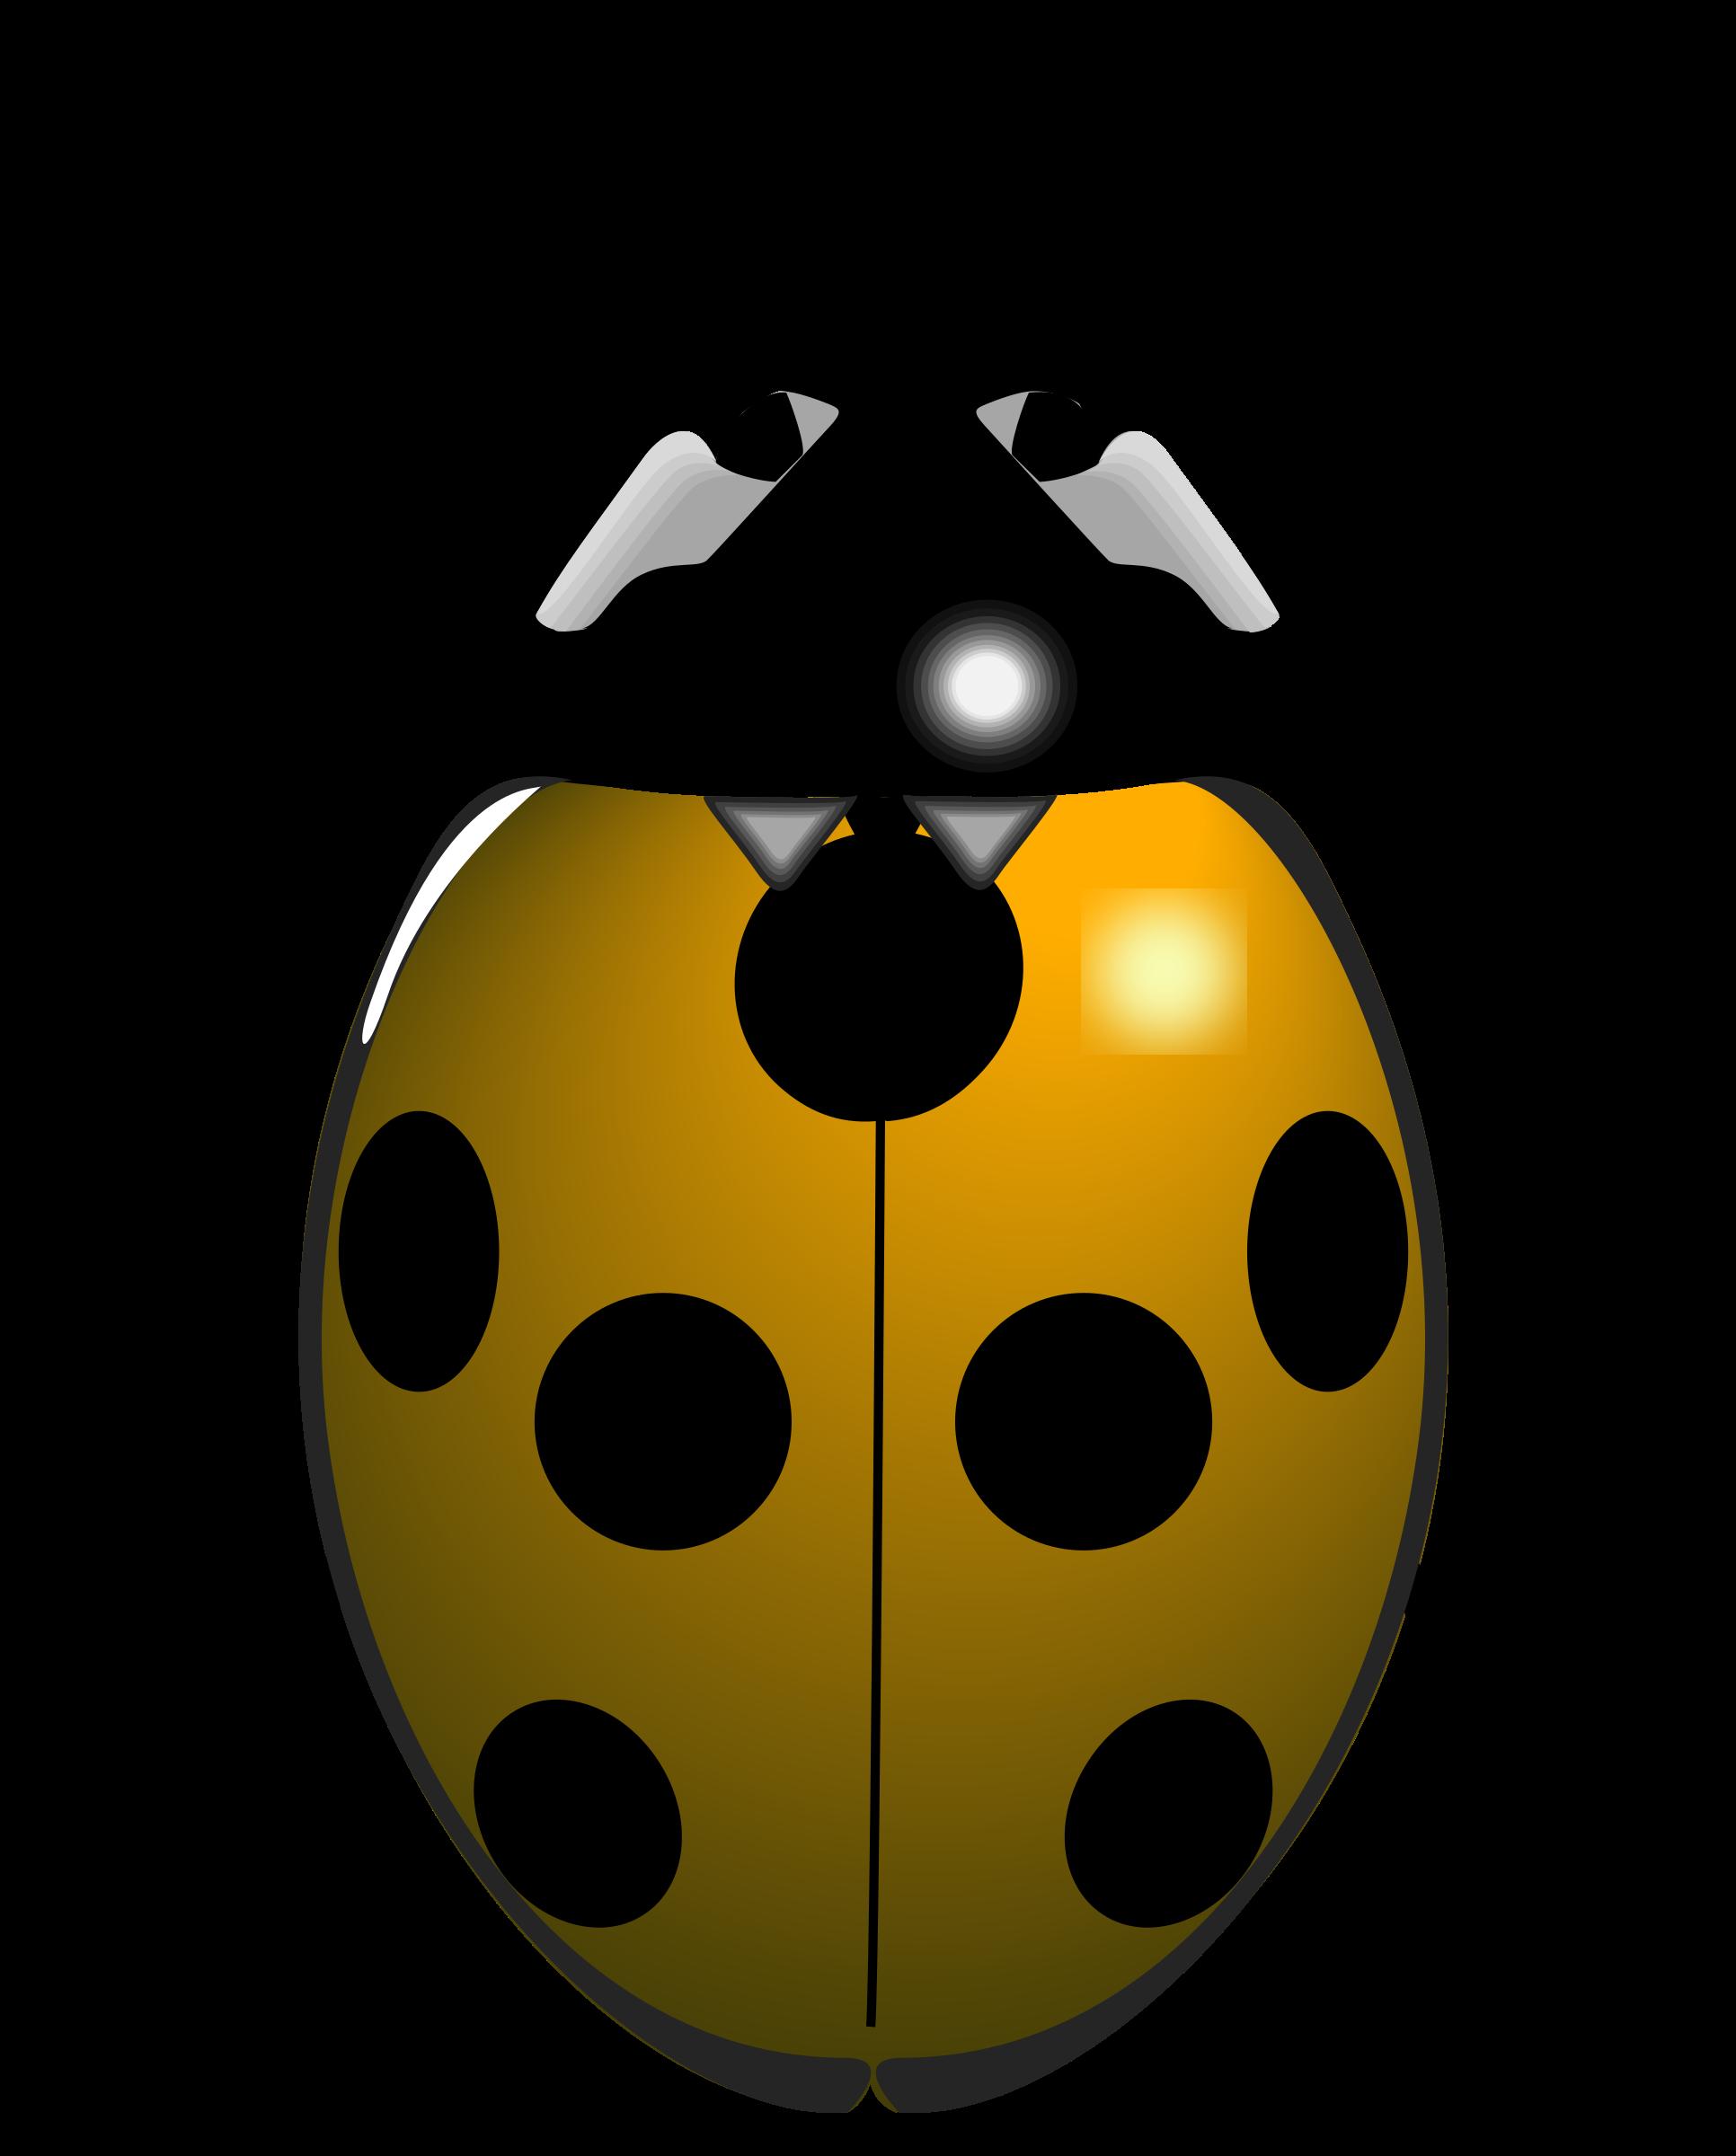 Ladybug big image png. Ladybugs clipart silhouette